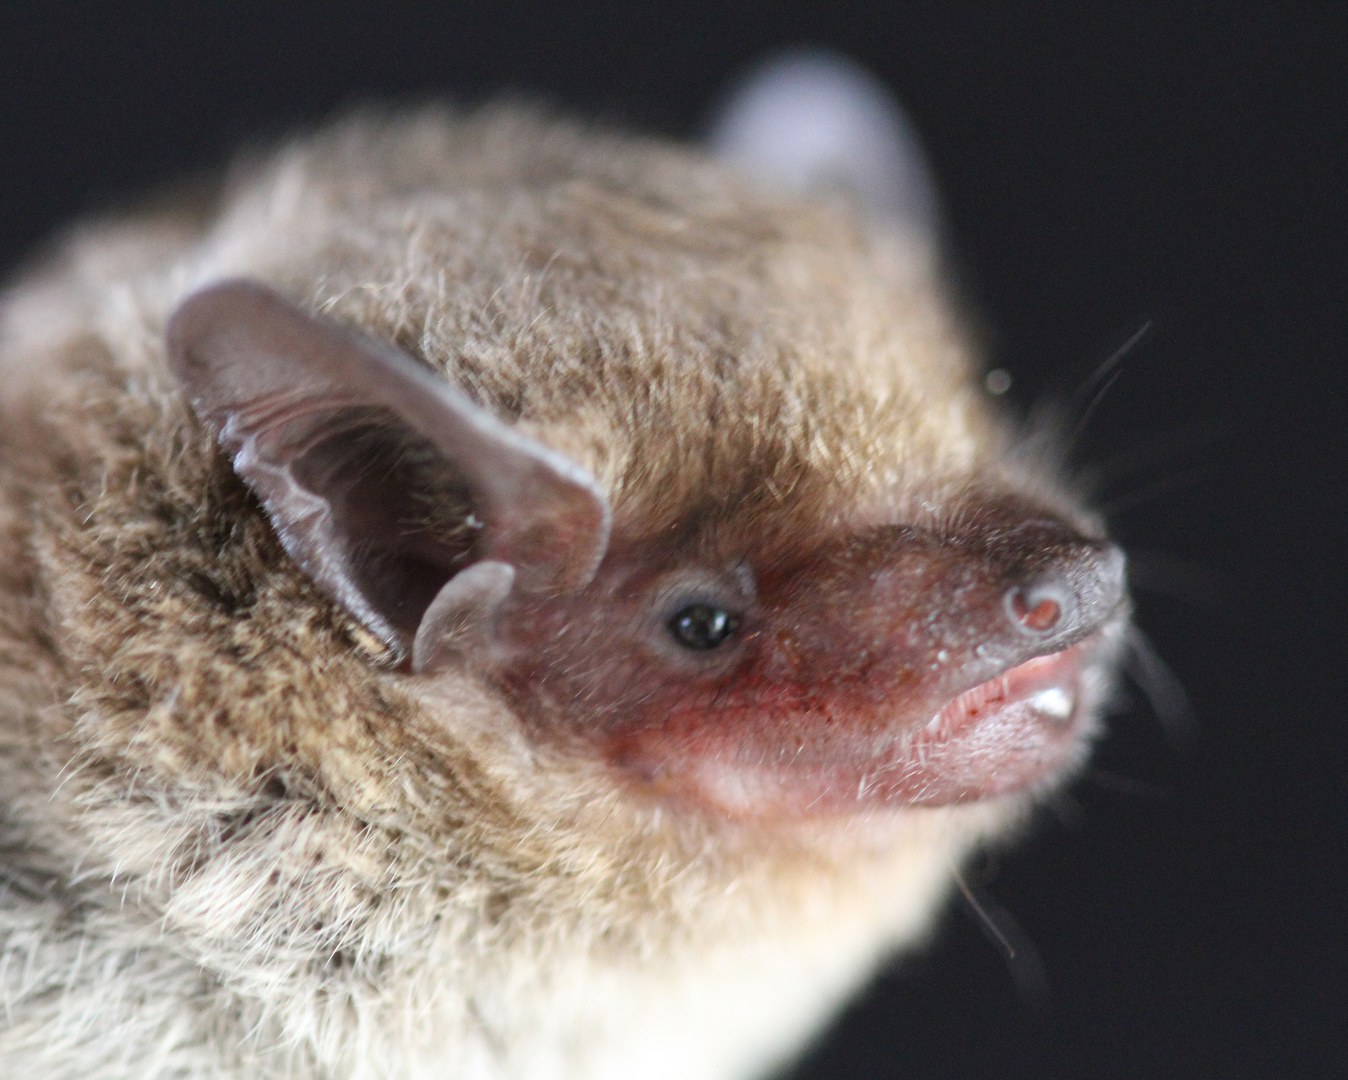 Fledermaus der Art Neoromicia cf. zuluensis: